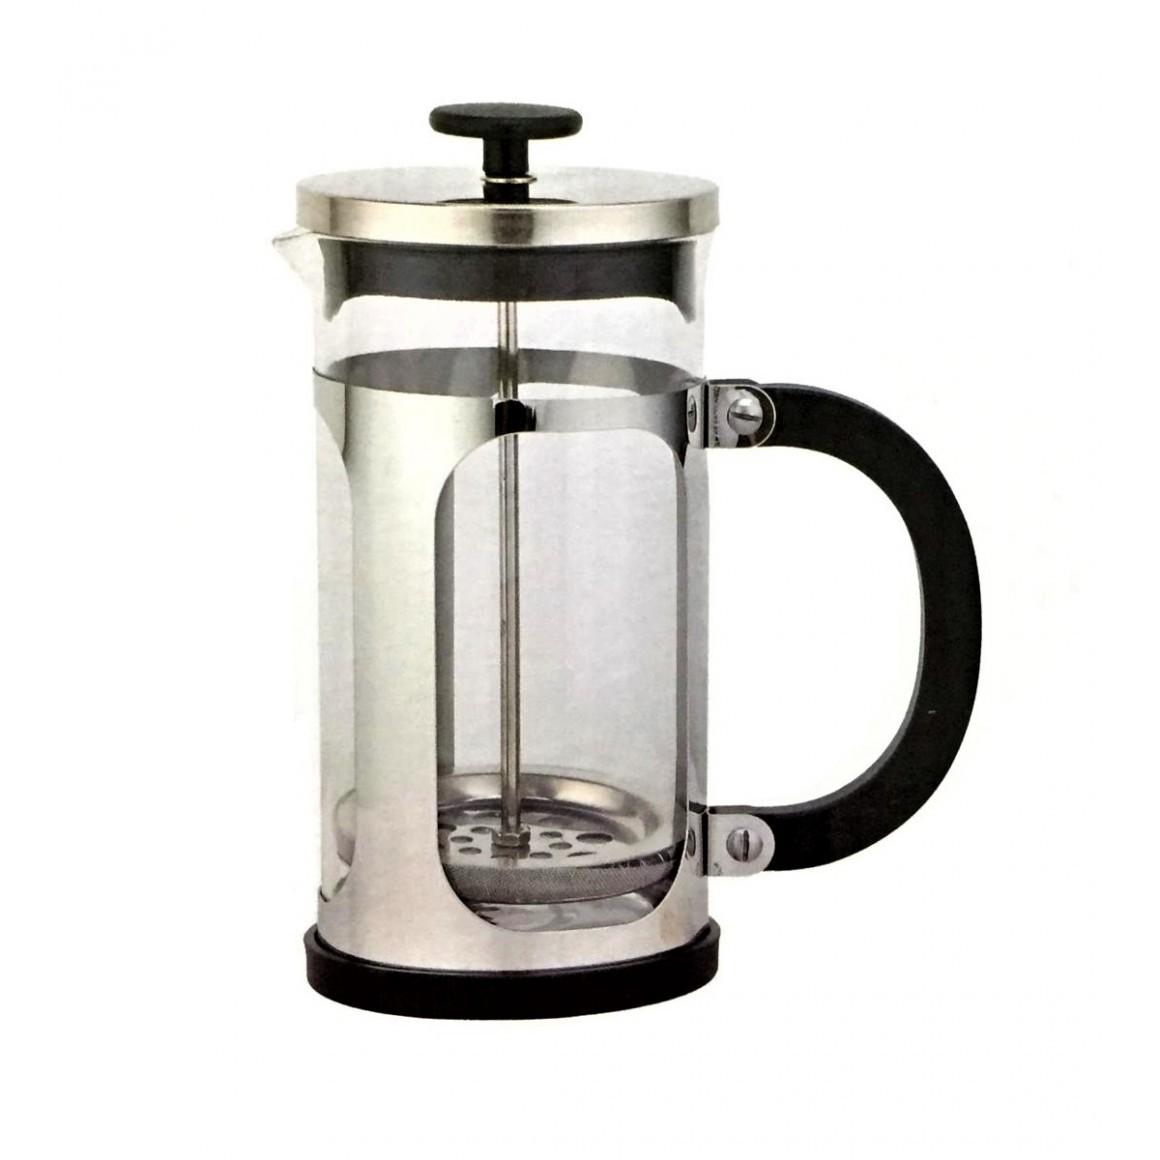 Cafeteira Prensa Francesa Vidro Inox Cremeira café chá 600ml